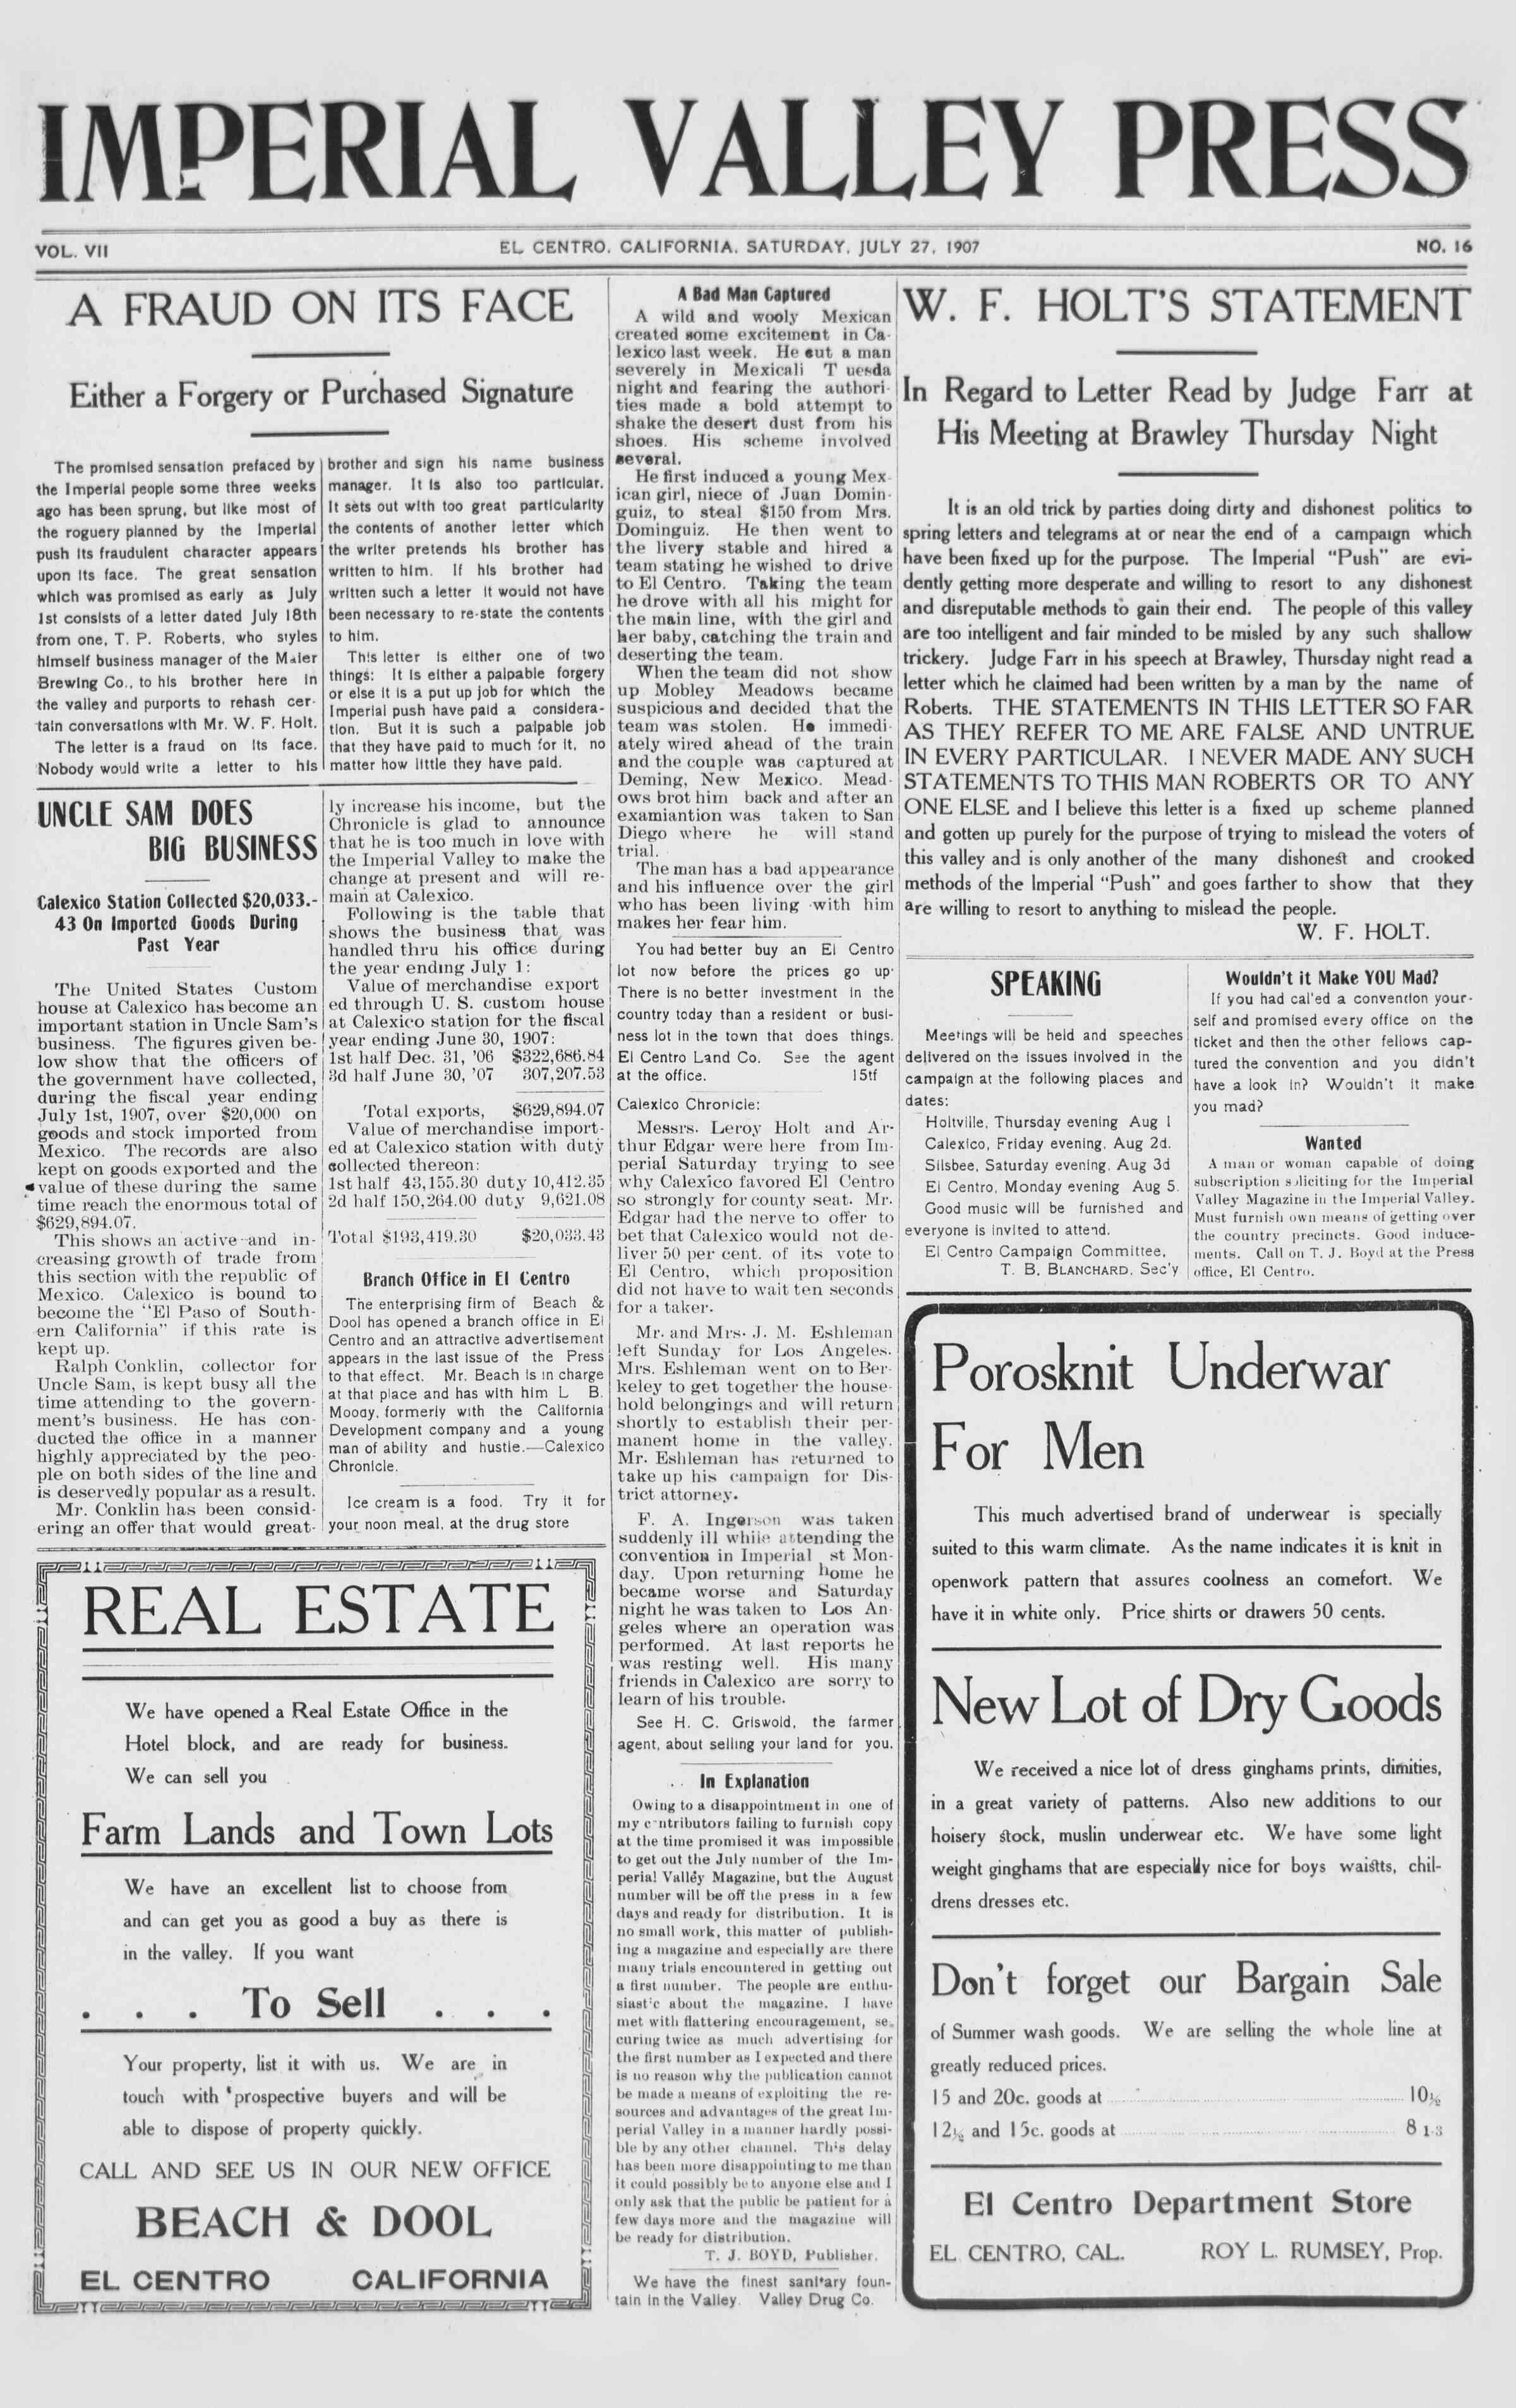 27 Temmuz 1907 Tarihli Imperial Valley Press Dergisi Sayfa 1